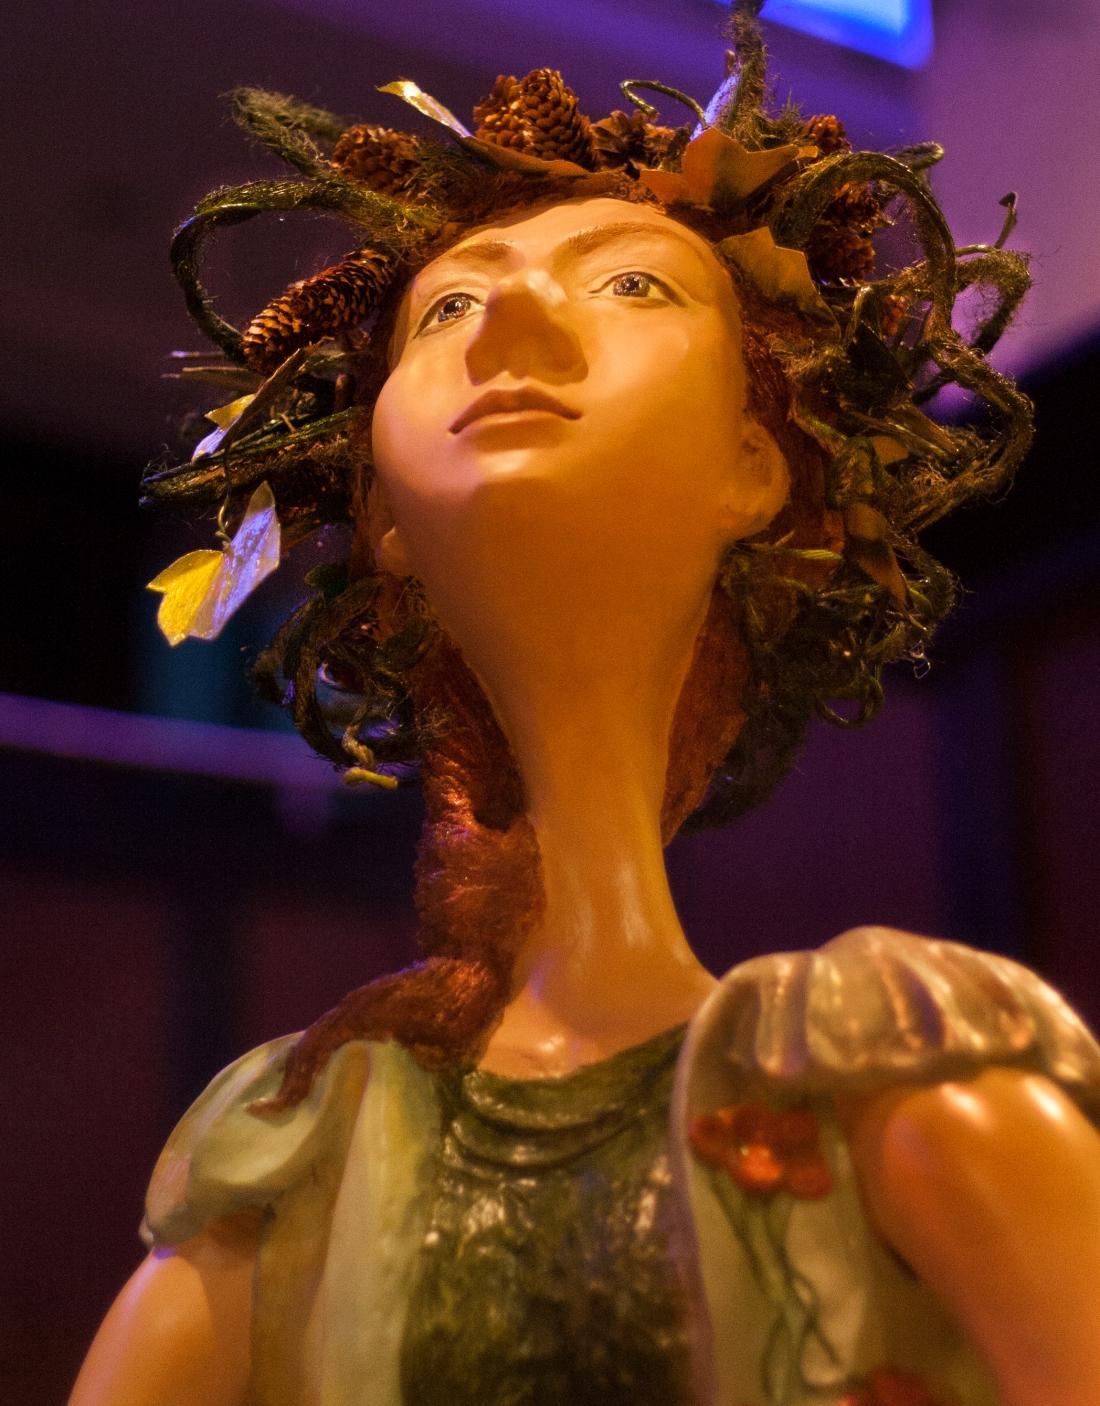 Sprite, Art Prize 2012